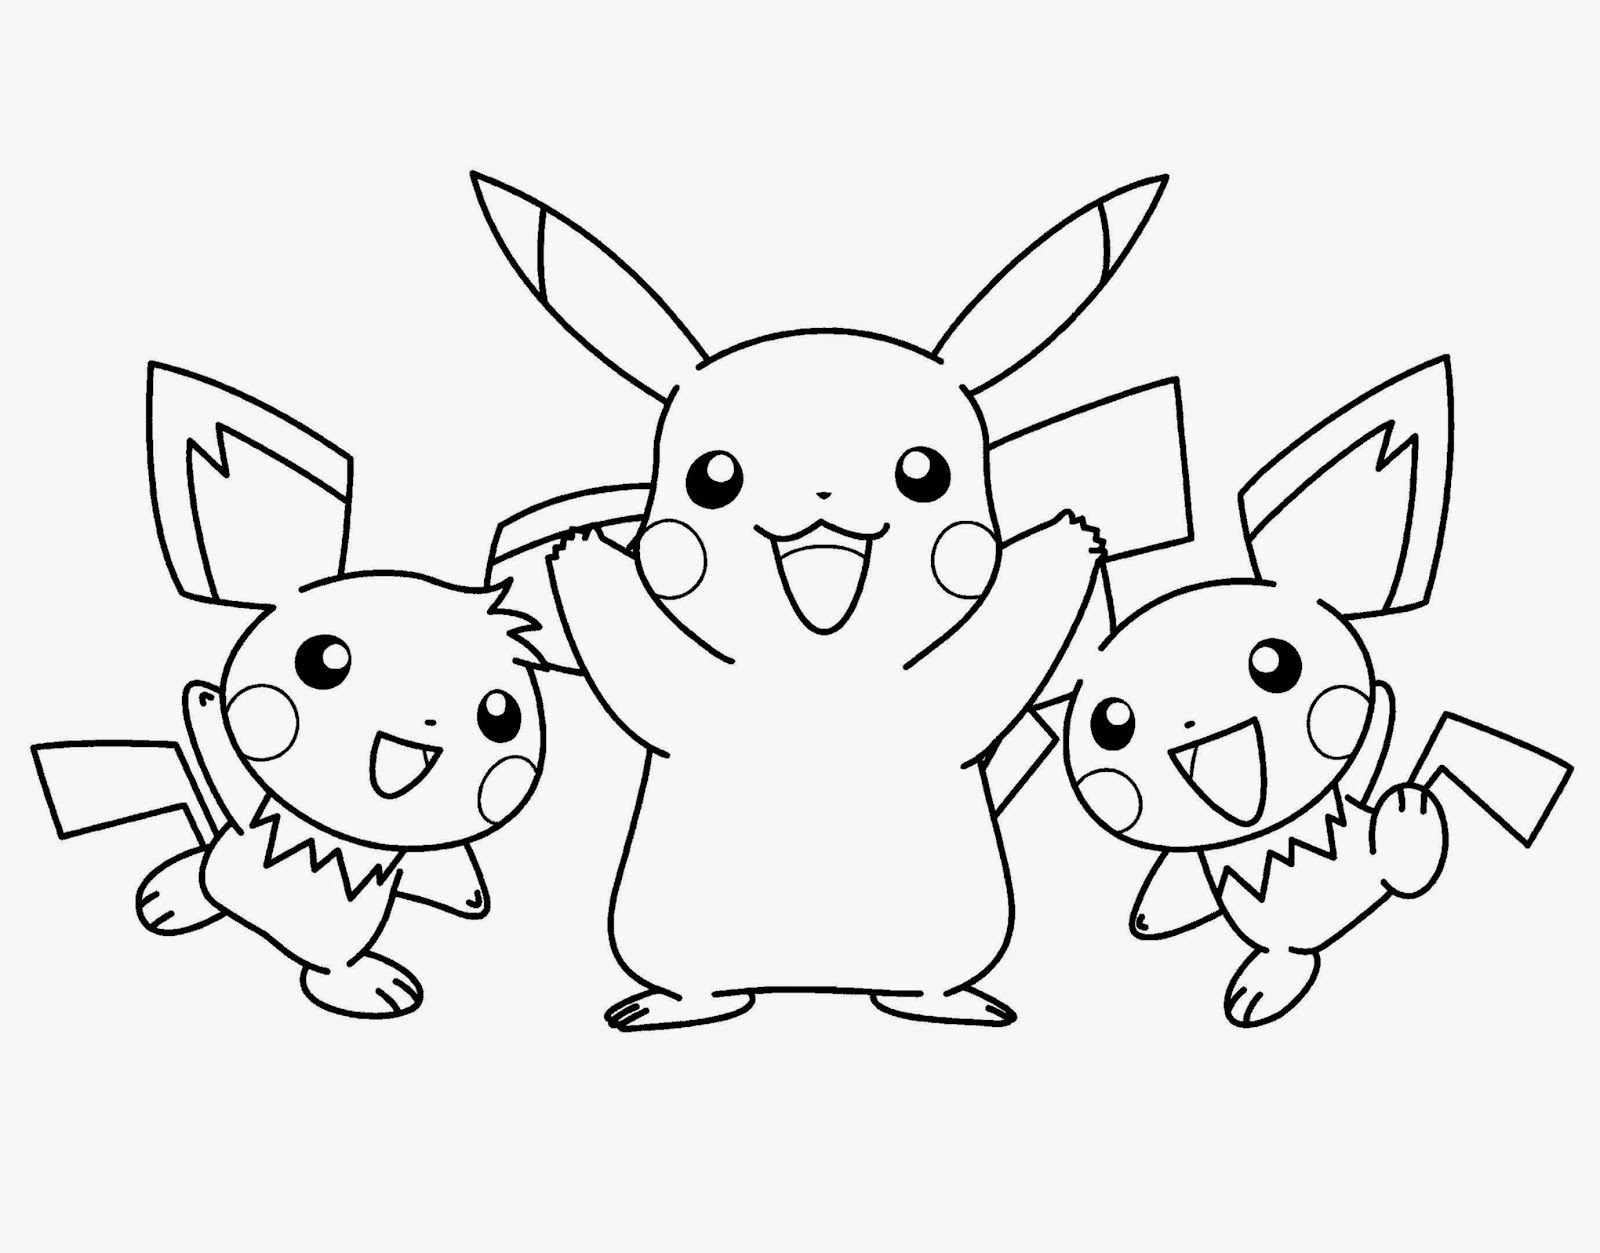 Pokemon Coloring Sheets | Free Coloring Sheet